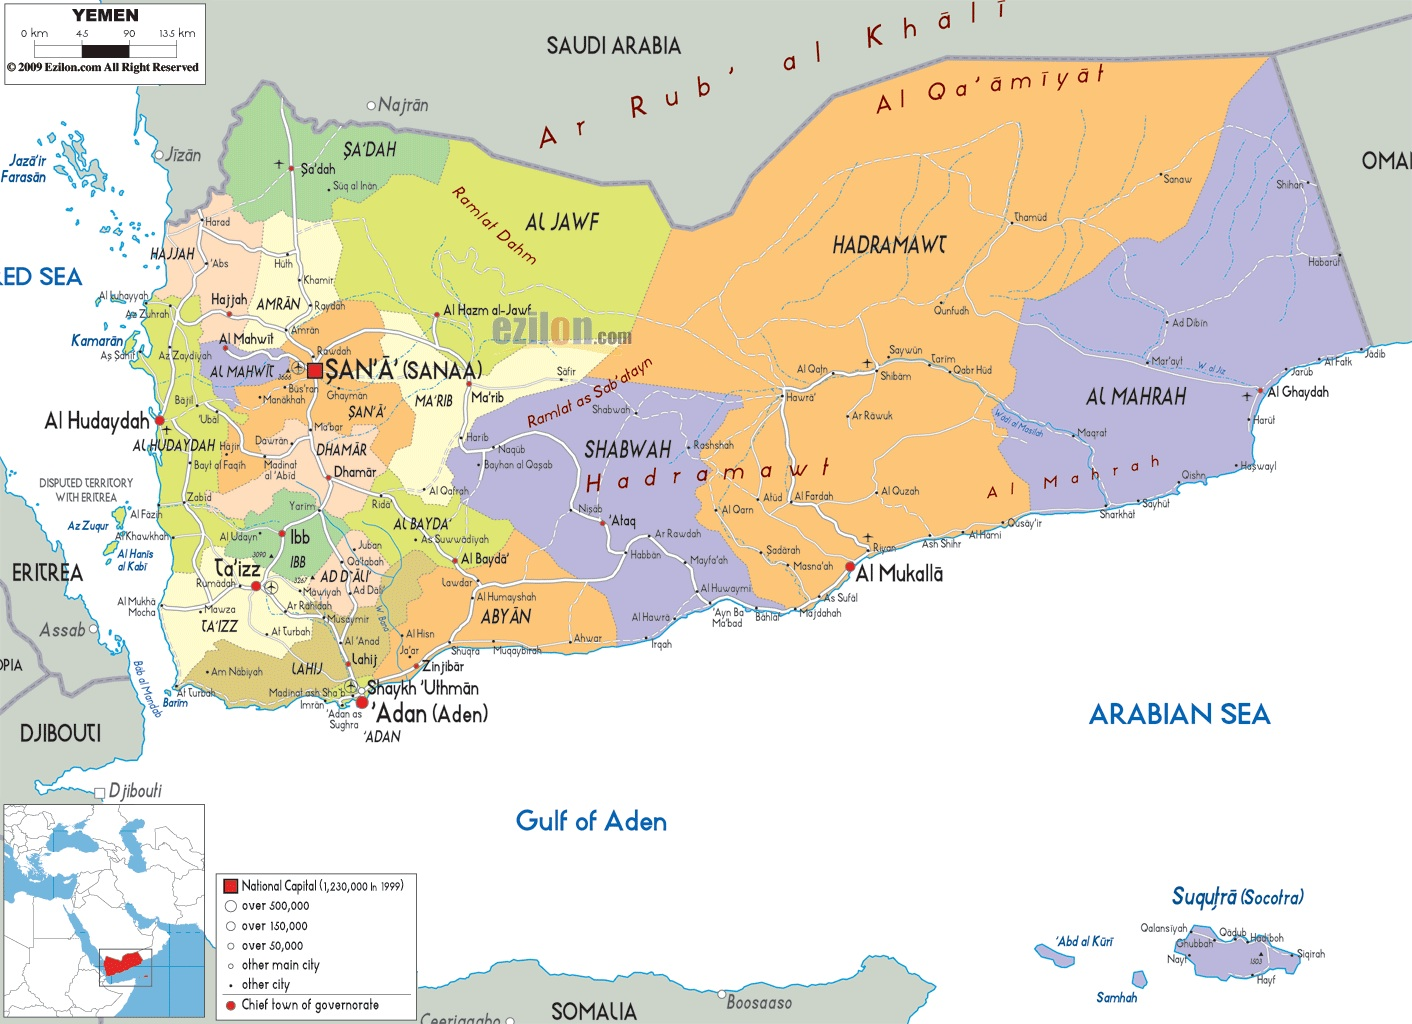 politicalmapofYemen misfits architecture